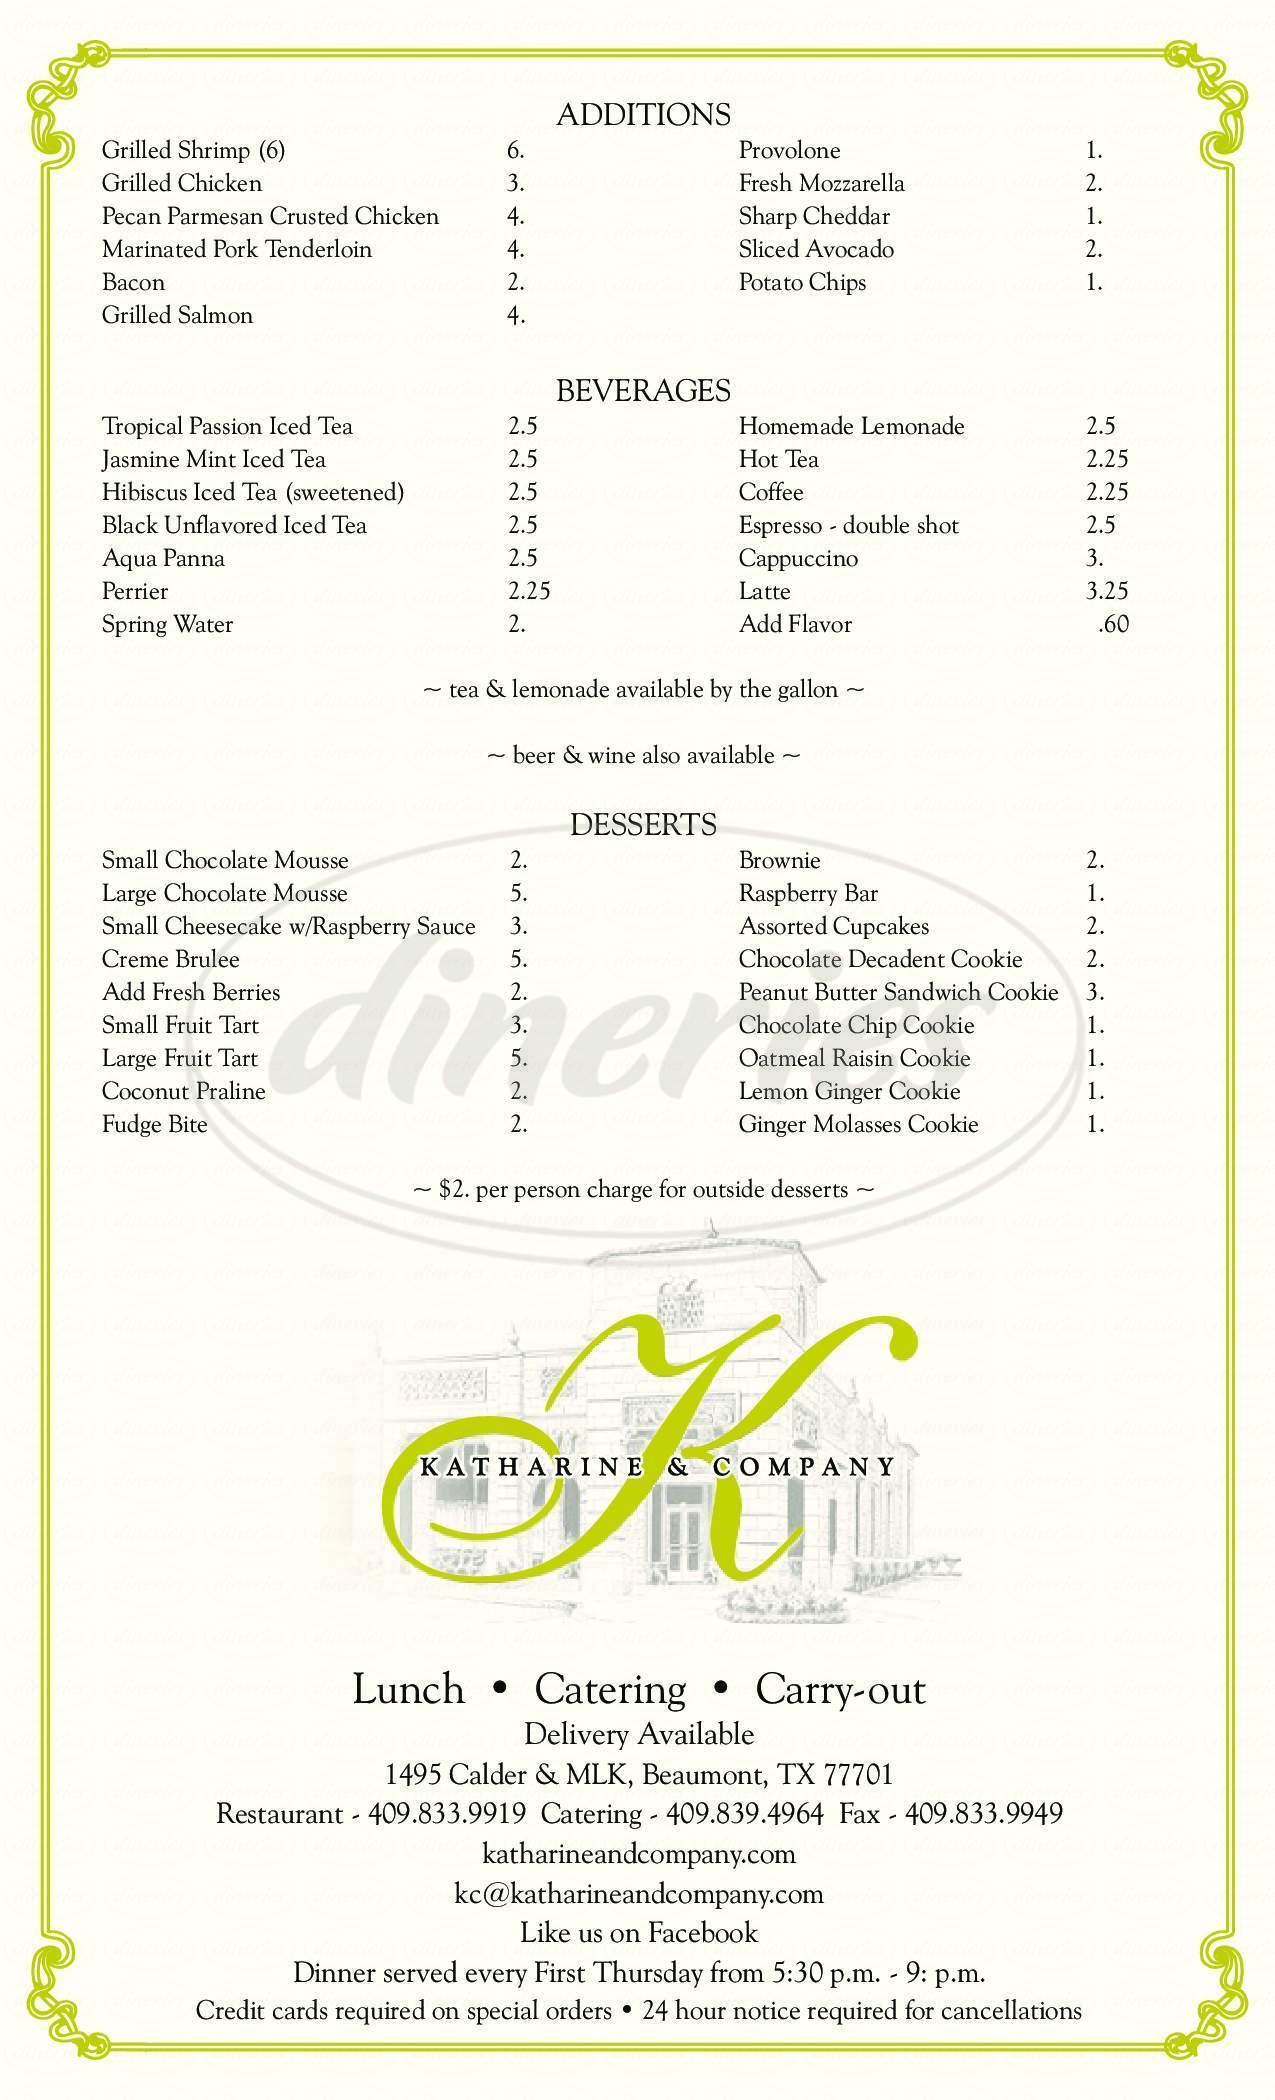 menu for Katharine & Company